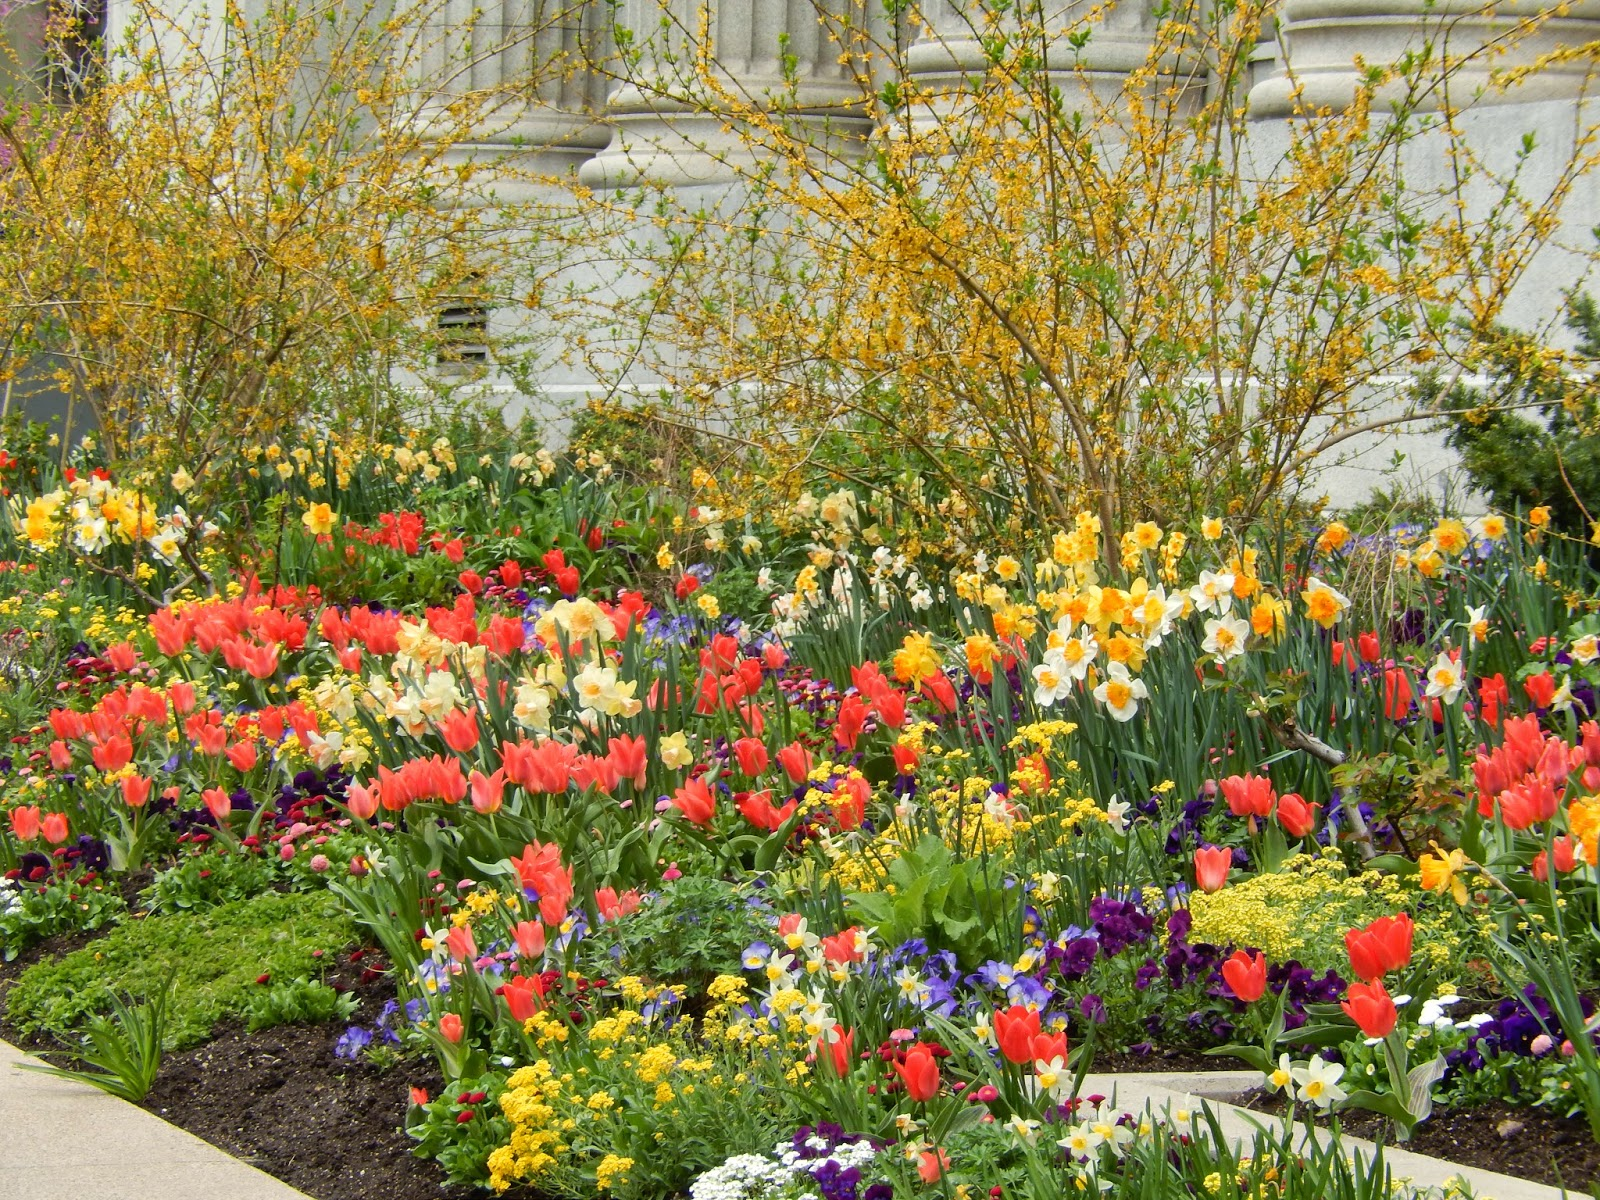 Secret Garden: The Most Amazing Garden Tour Ever